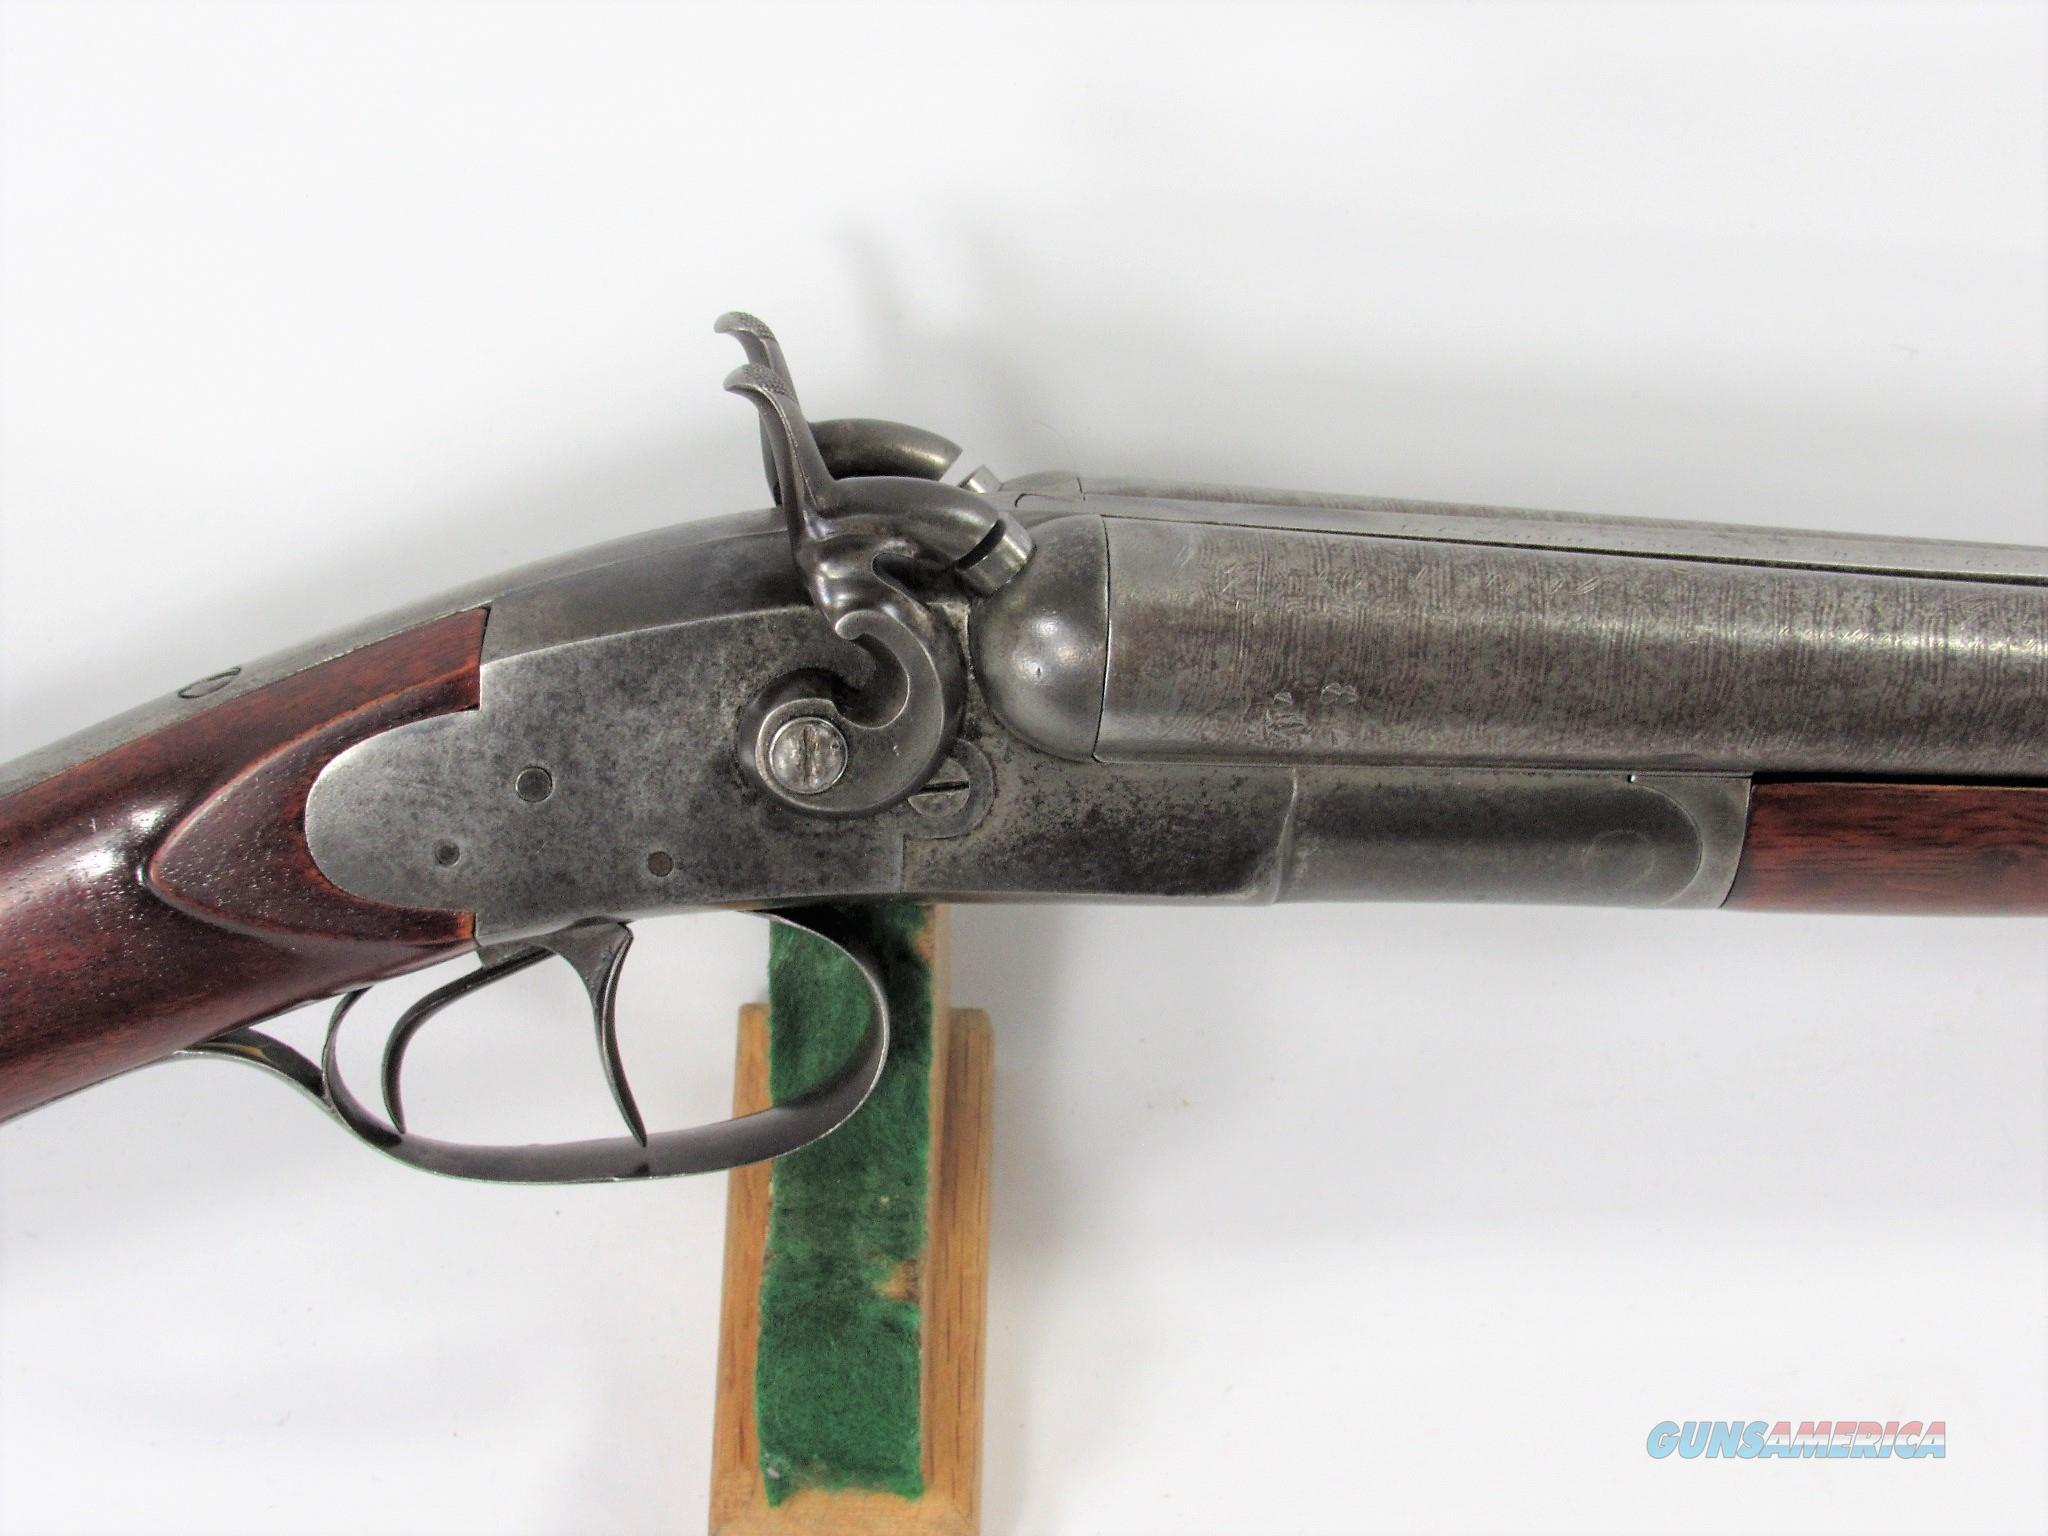 1015 LC SMITH MAKER BAKER GUN SYRACUSE 12GA  Guns > Shotguns > L.C. Smith Shotguns